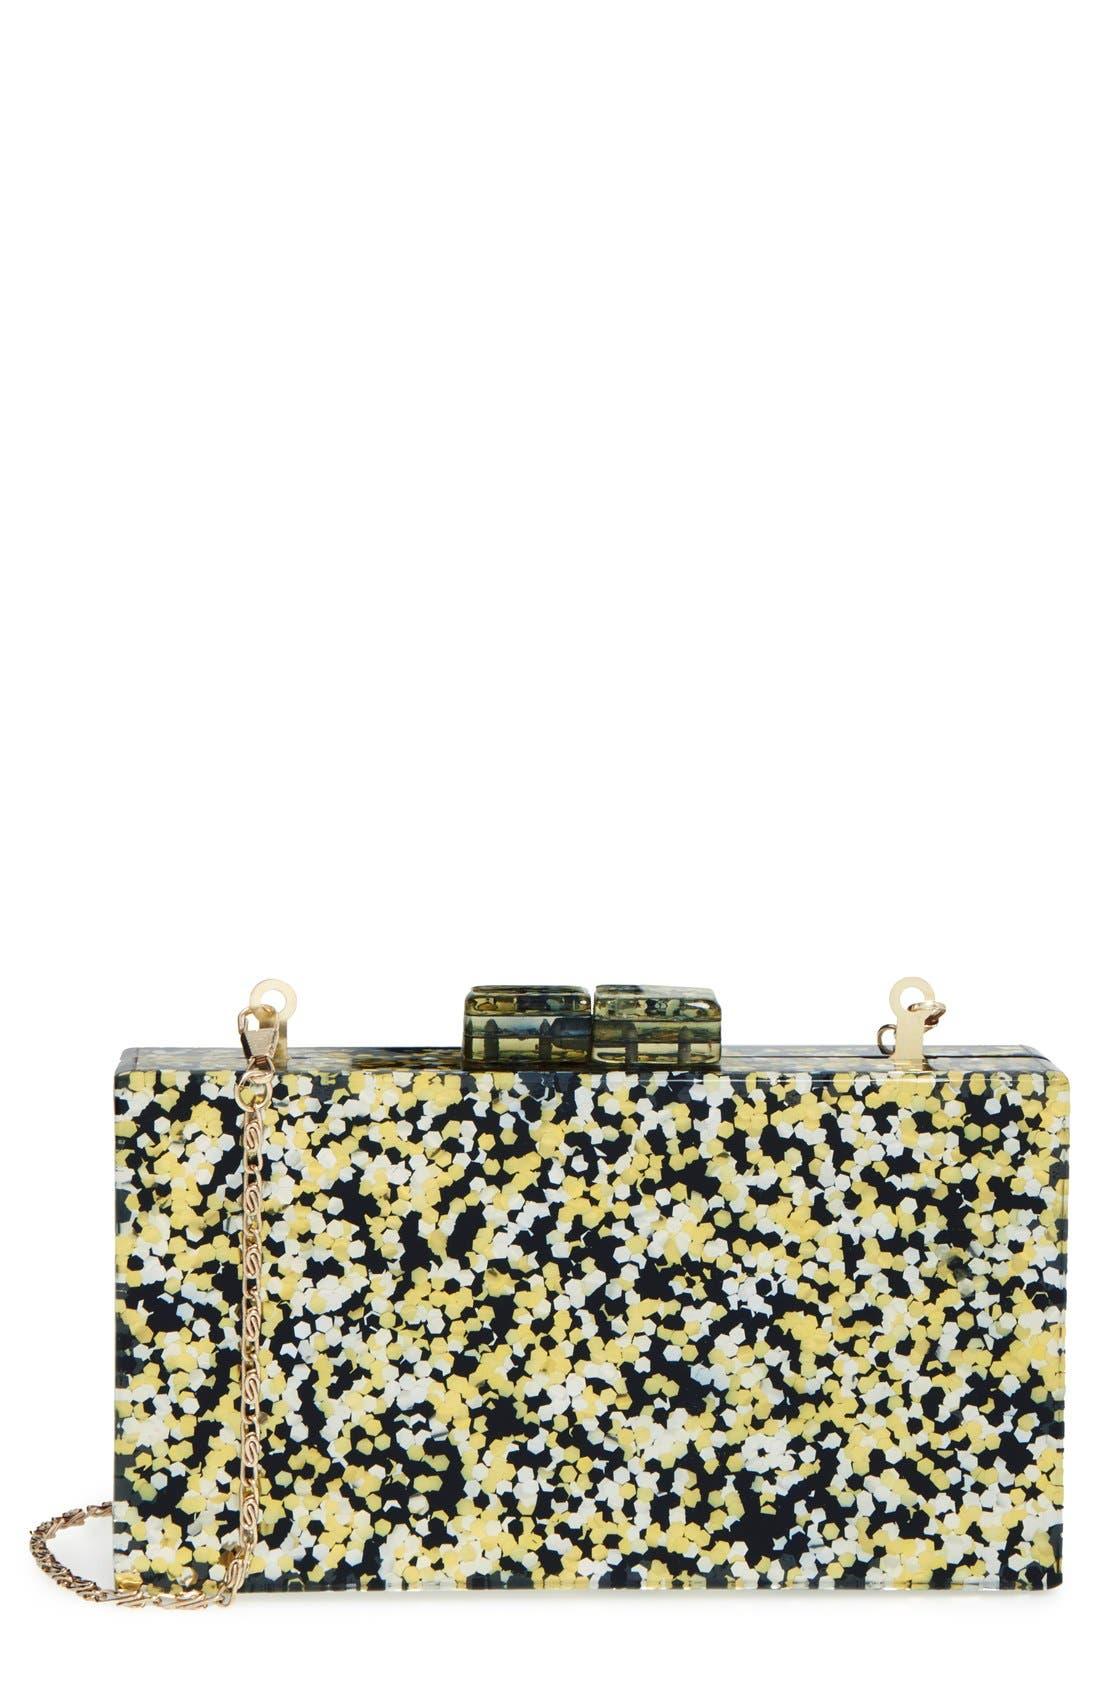 Couture Box Clutch,                             Main thumbnail 1, color,                             001